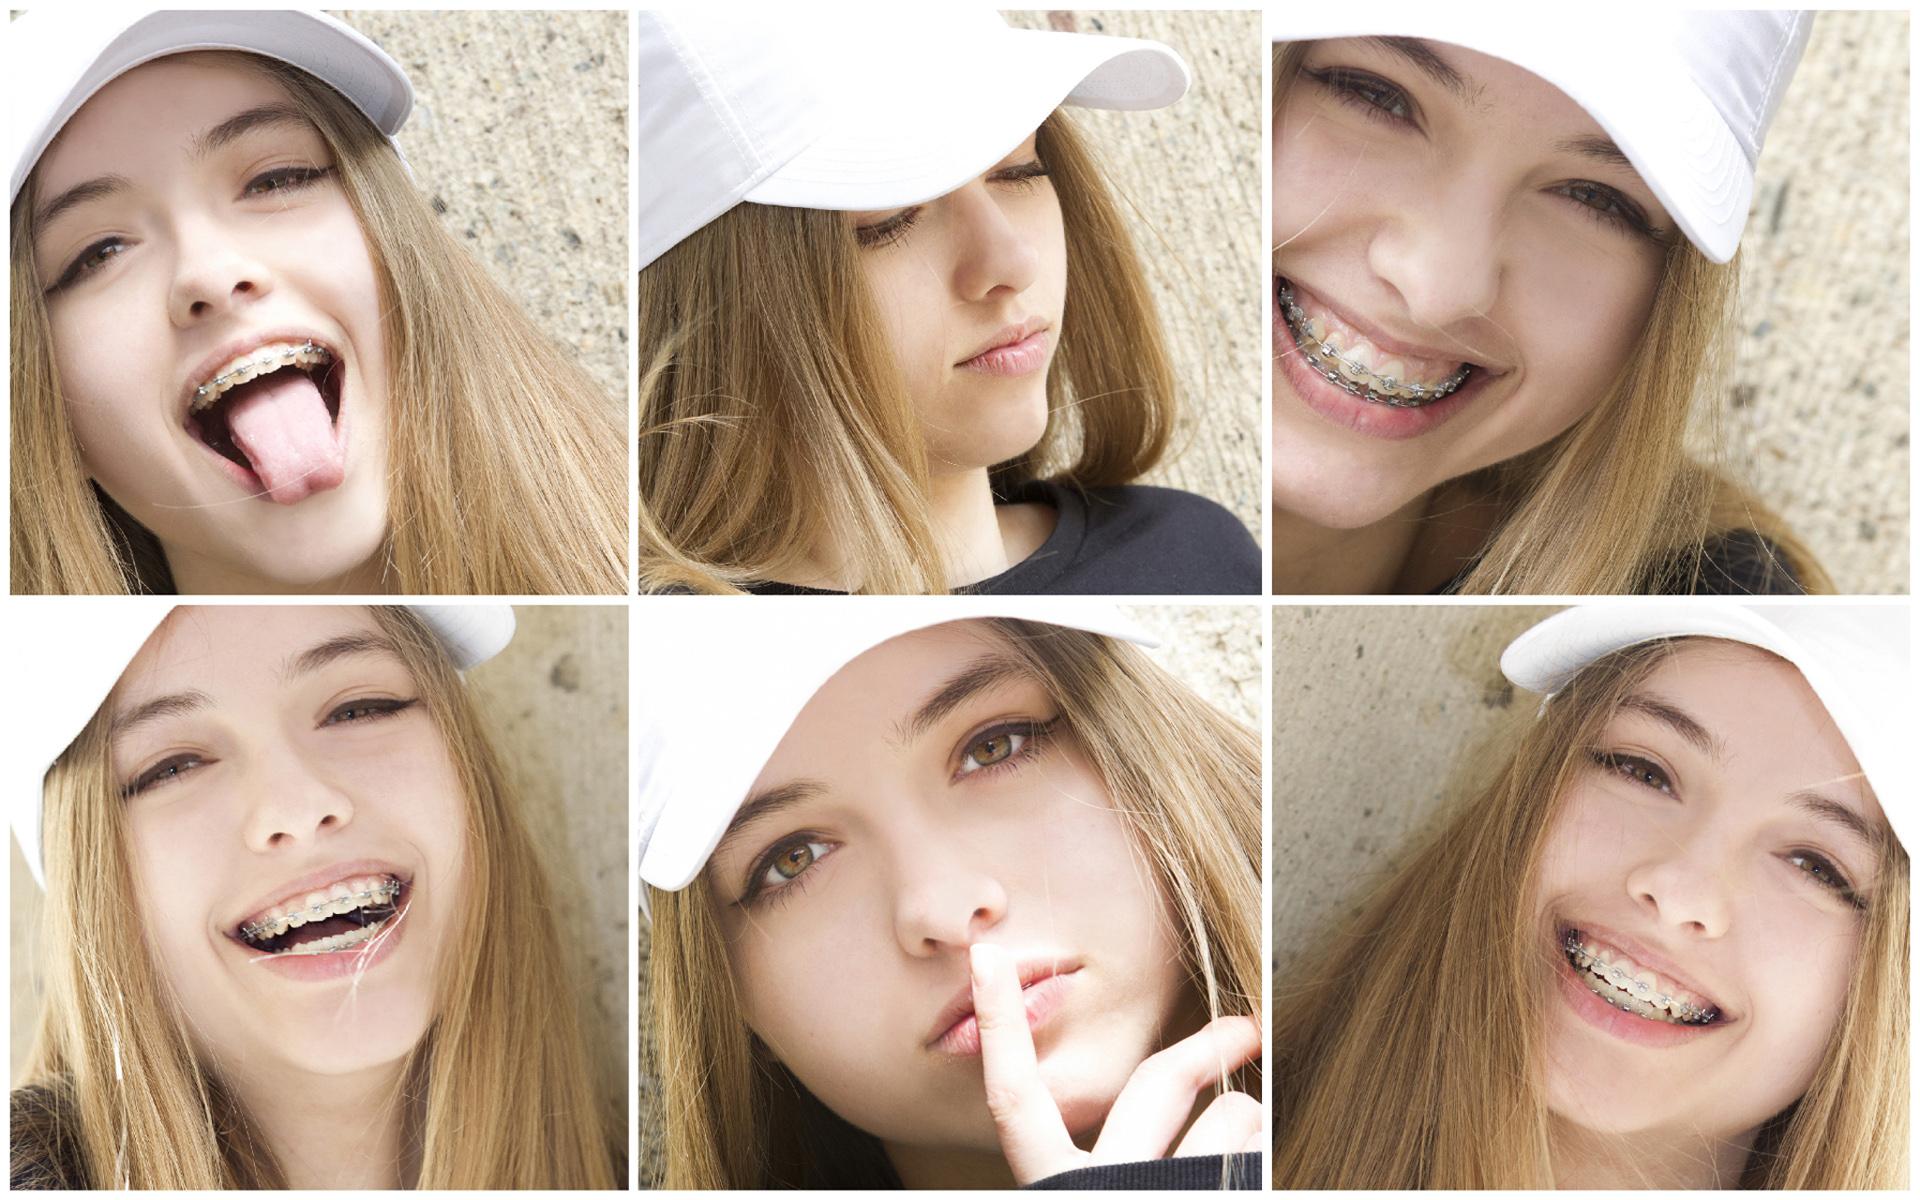 ALEA_BLOG-Collage2